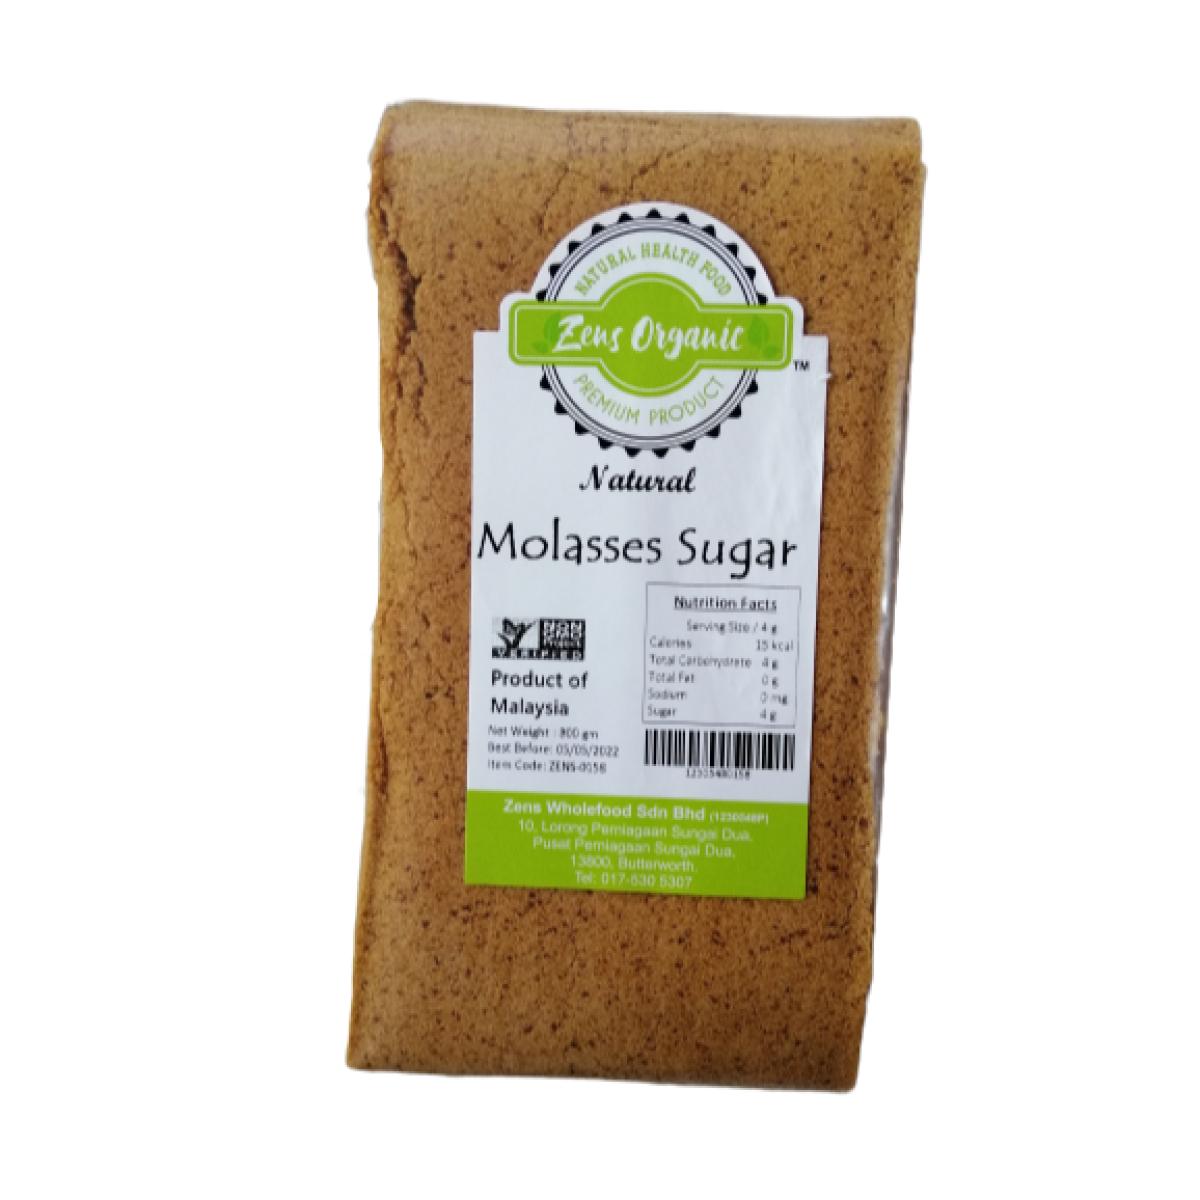 Zens Organic Natural Molasses Sugar 800g